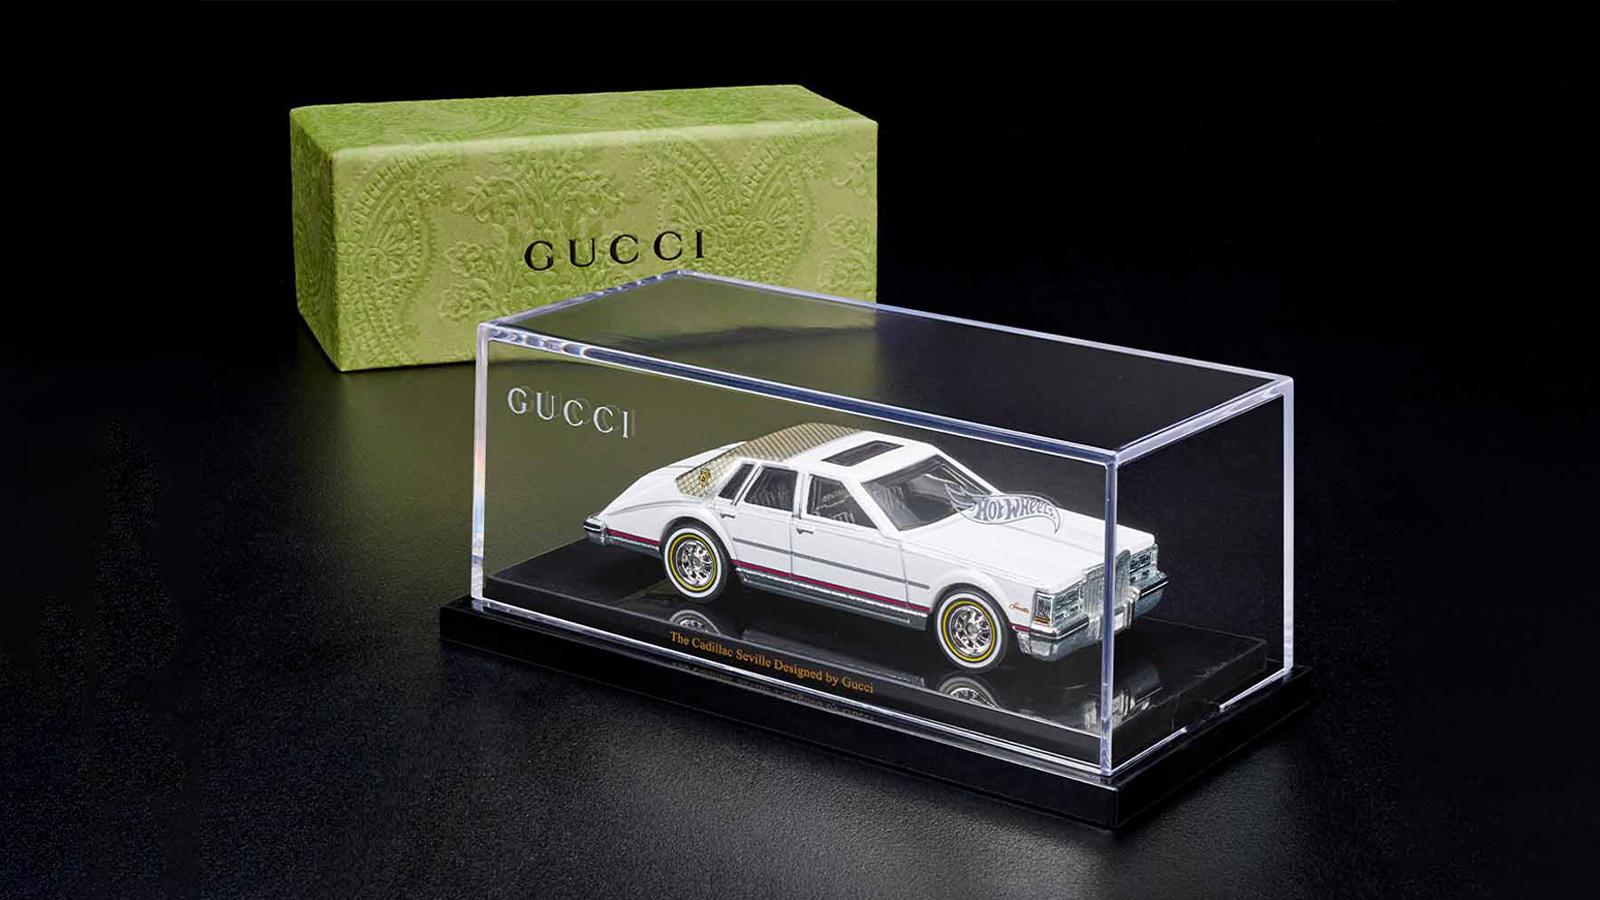 Gucci x Hot Wheels Cadillac Seville